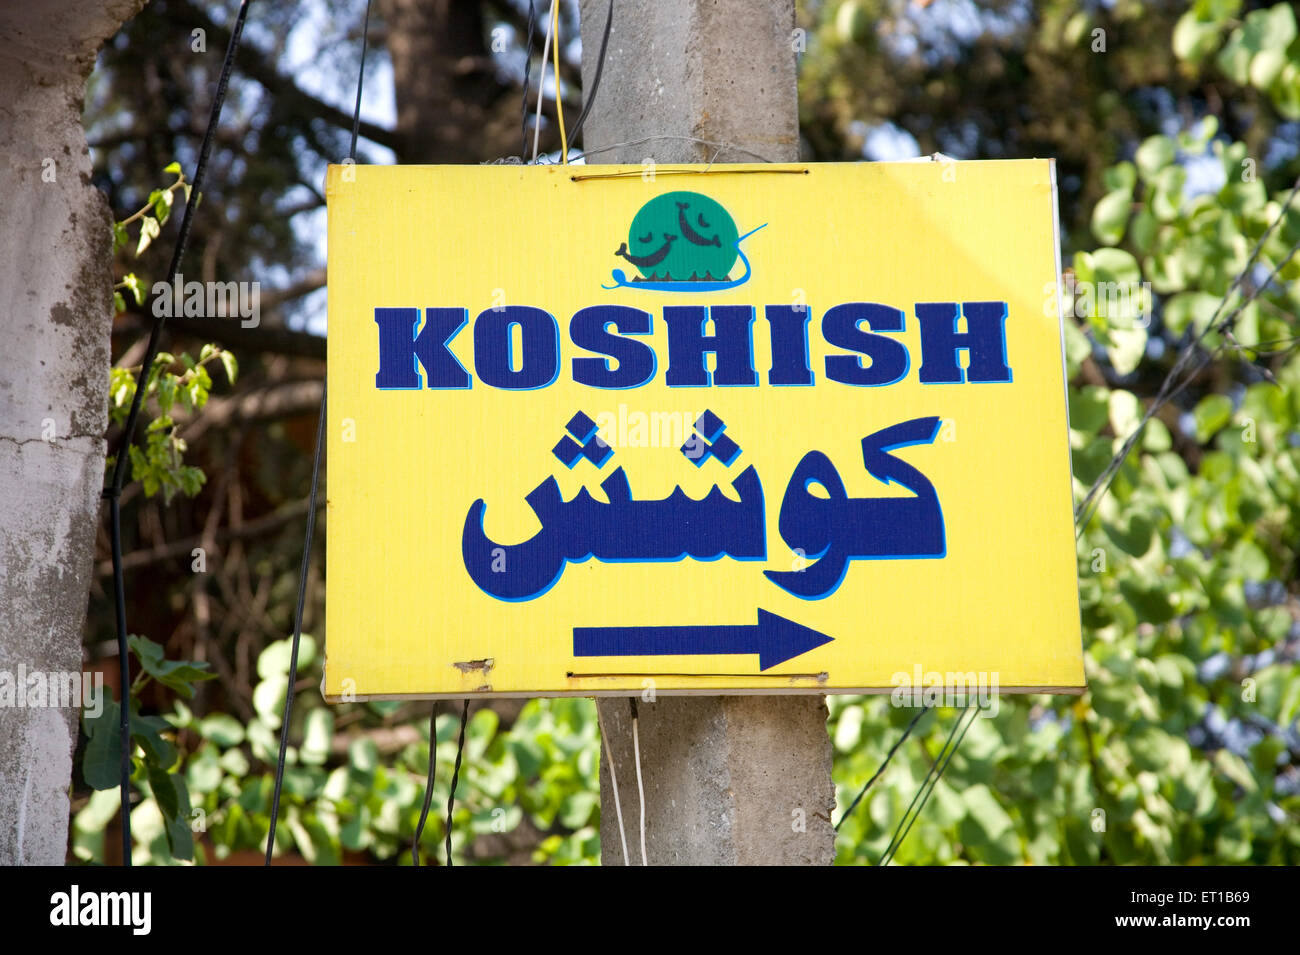 Koshish written in roman and urdu script on board at Srinagar ; Jammu and Kashmir ; India - Stock Image